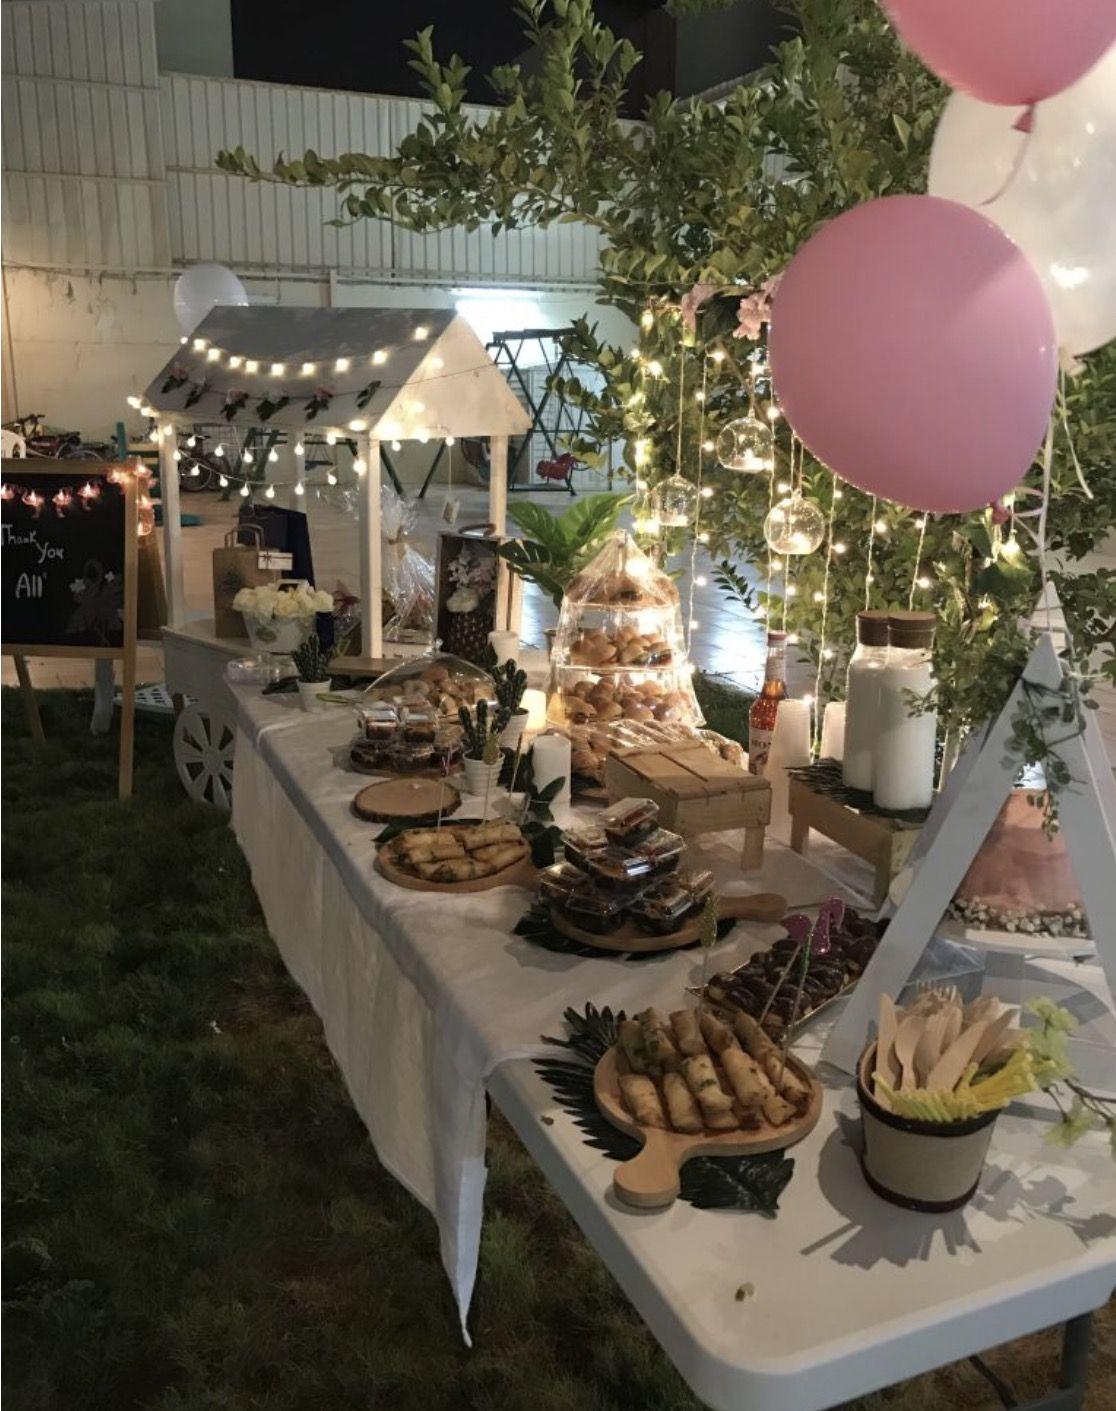 أفكار لحفلات تخرج حساب صاحبه فكرة انستغرام Saraalshay3 يوتيوب The Delight In White T Candy Table Table Decorations Decor